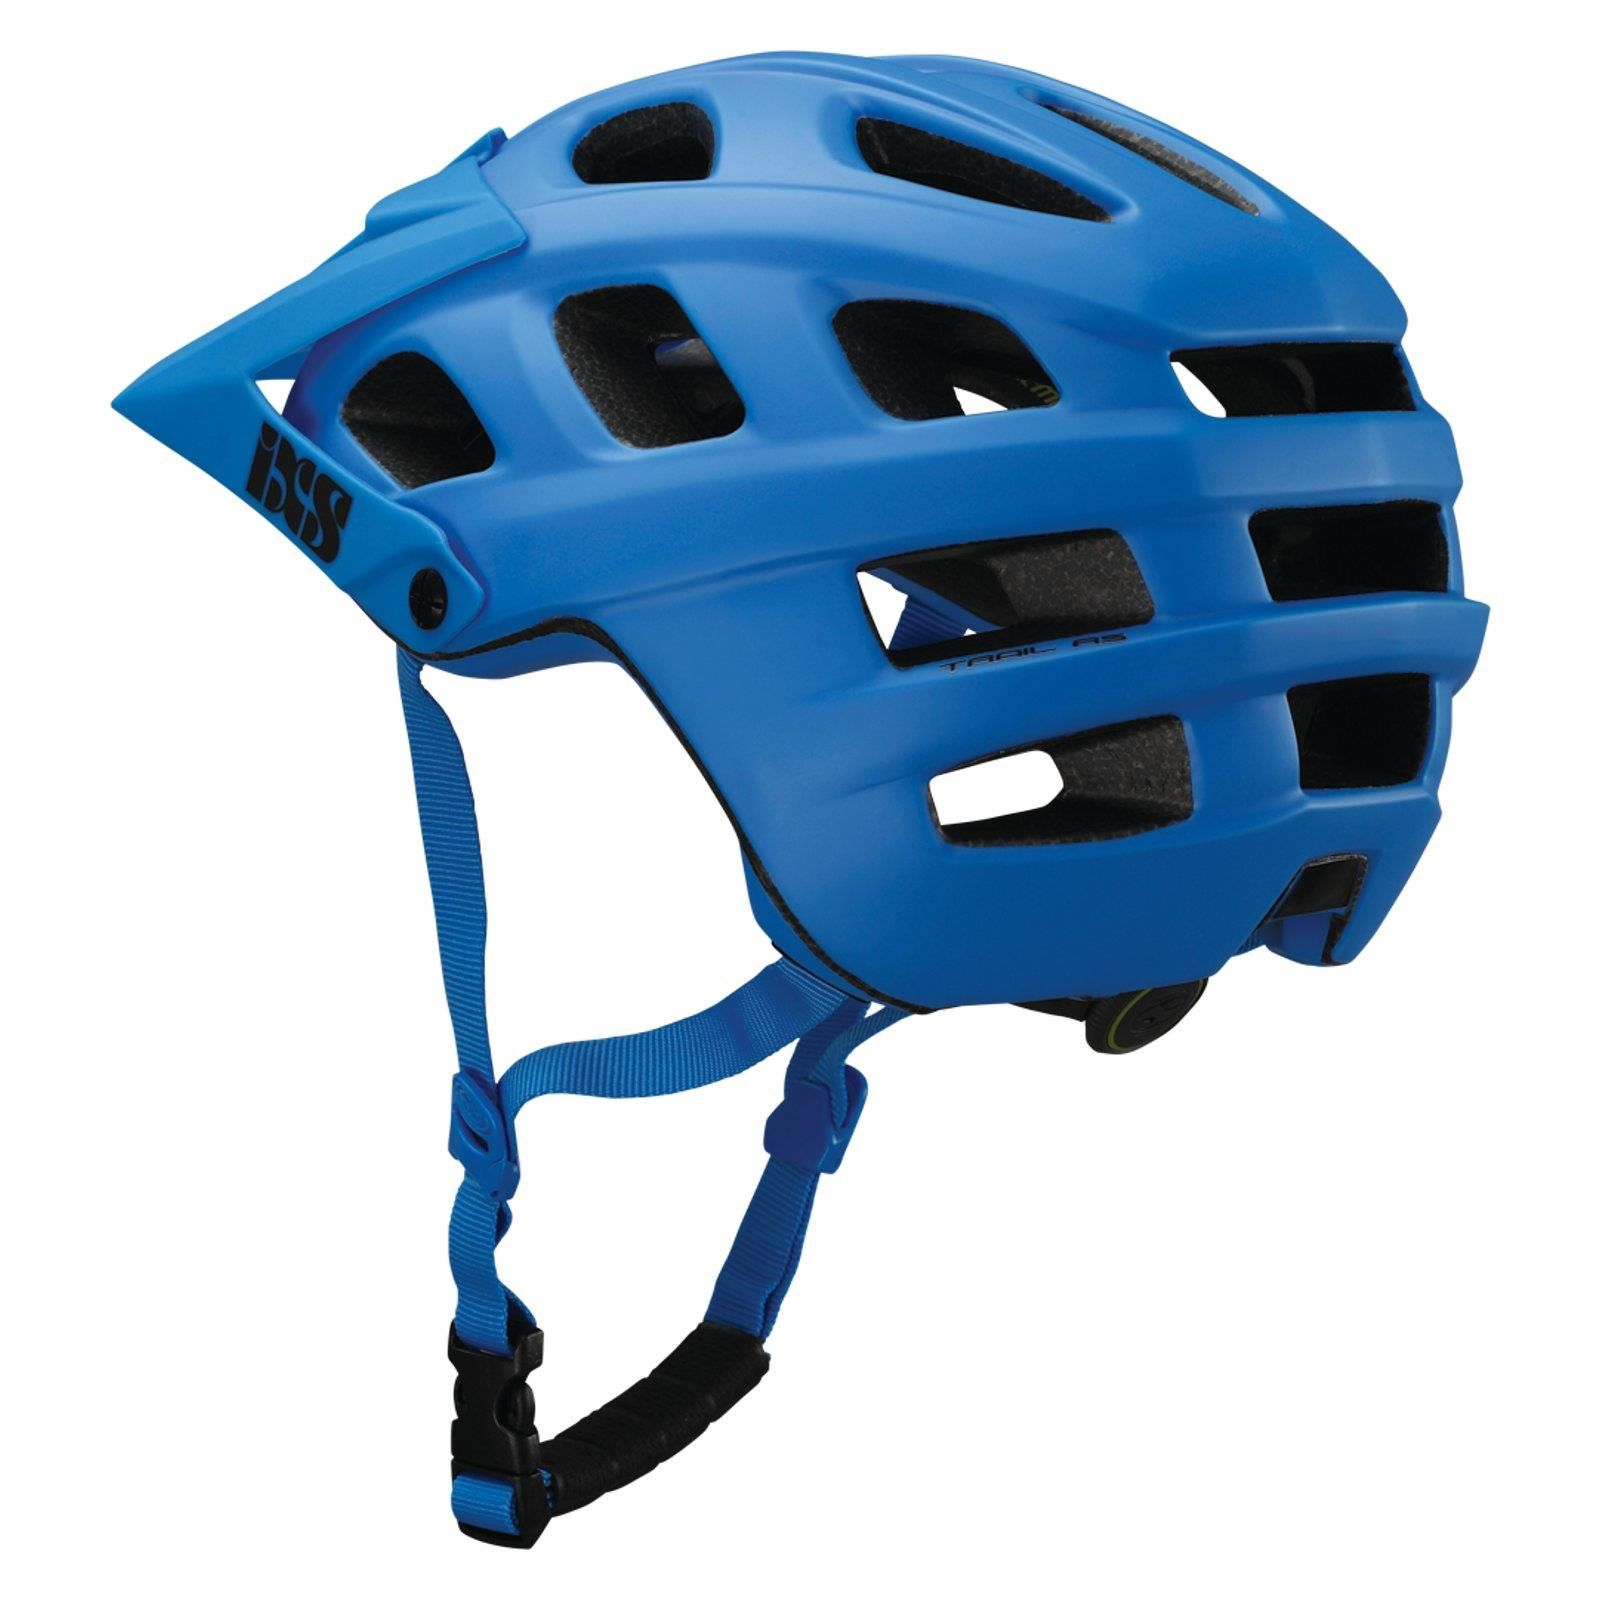 Ixs Trail Rs Evo Fahrrad Helm All Mountain Bike Am Mtb Enduro Dh Downhill Inmold Enduro Mtb All Mountain Bike Bike